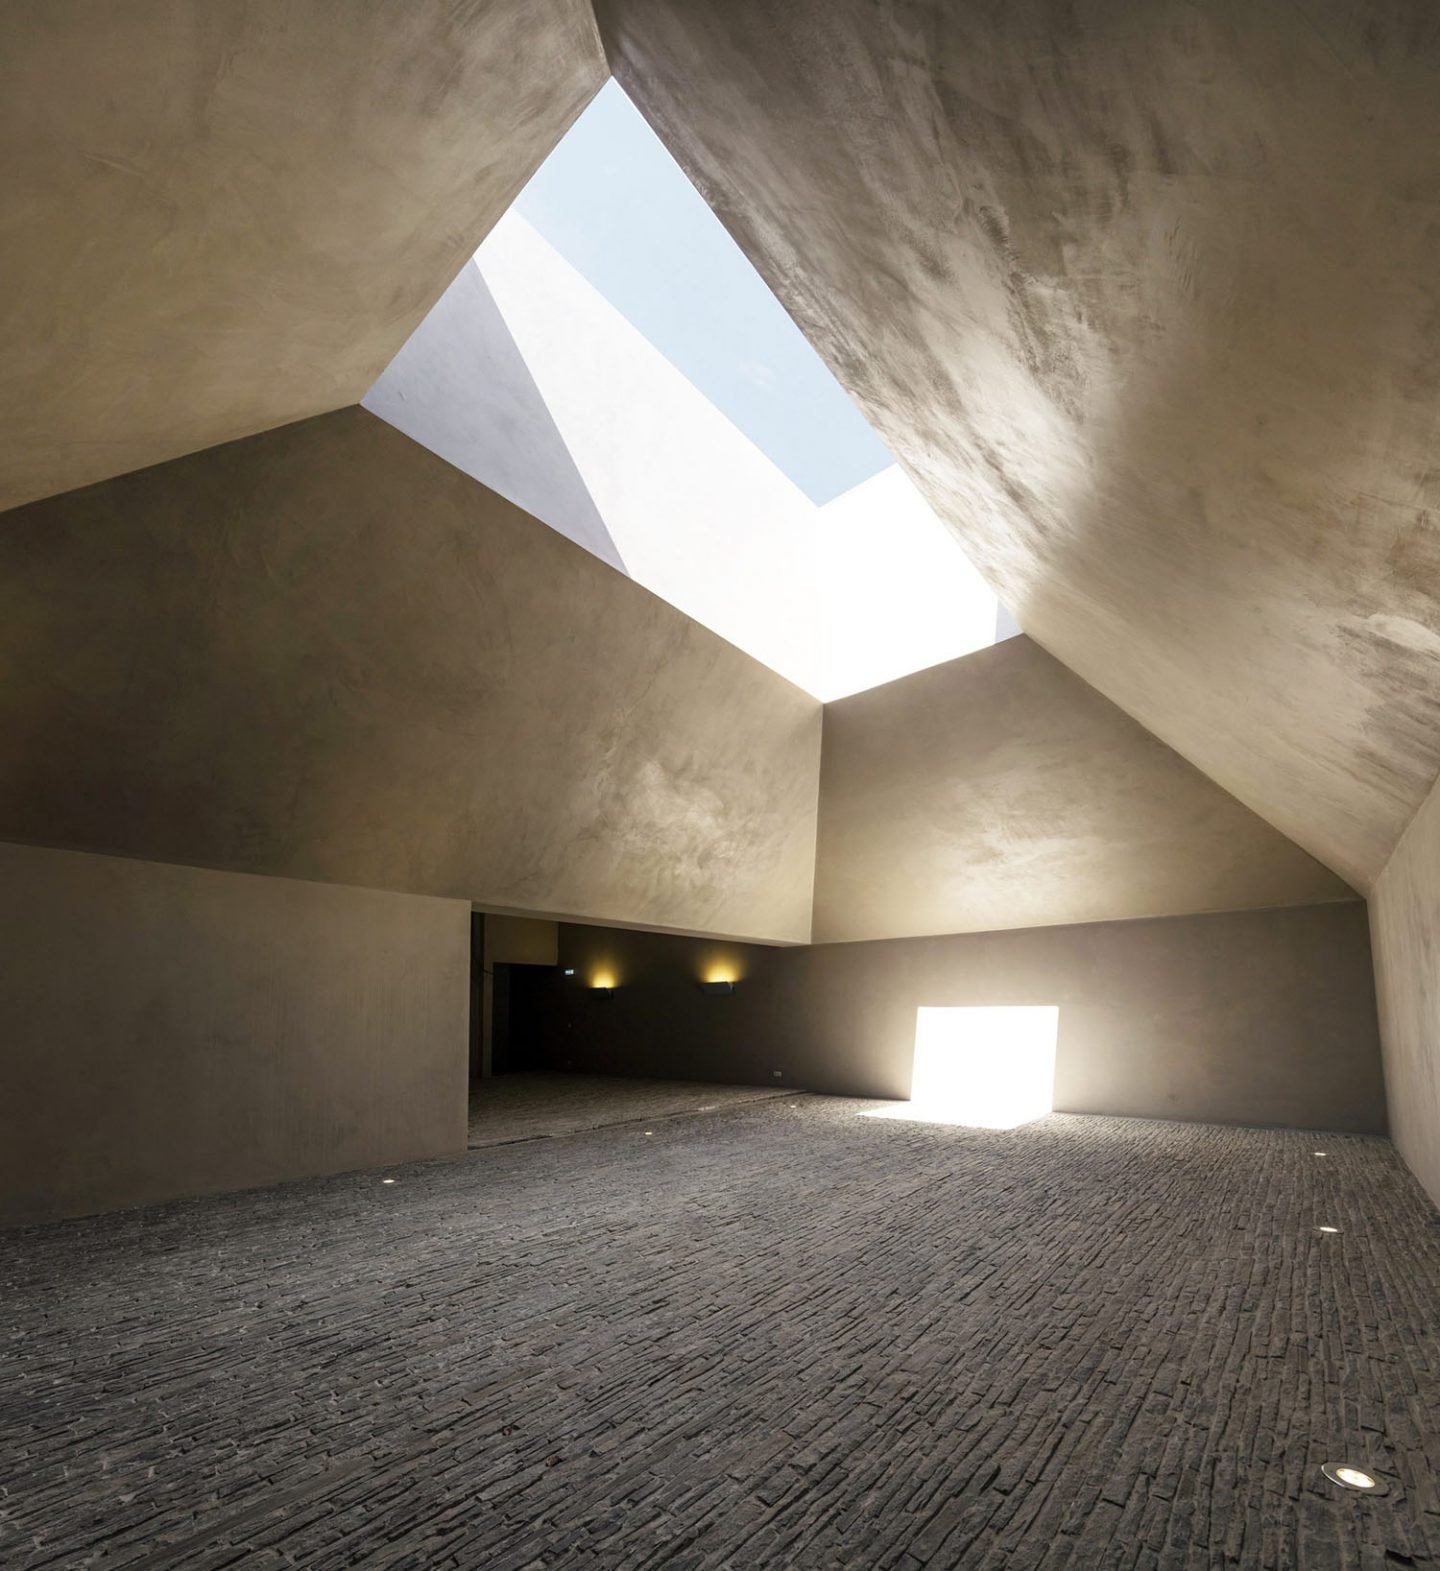 iGNANT_Architecture_Herdade_Of_Freixo_Winery_Frederico_Valsassina_Arquitectos_9